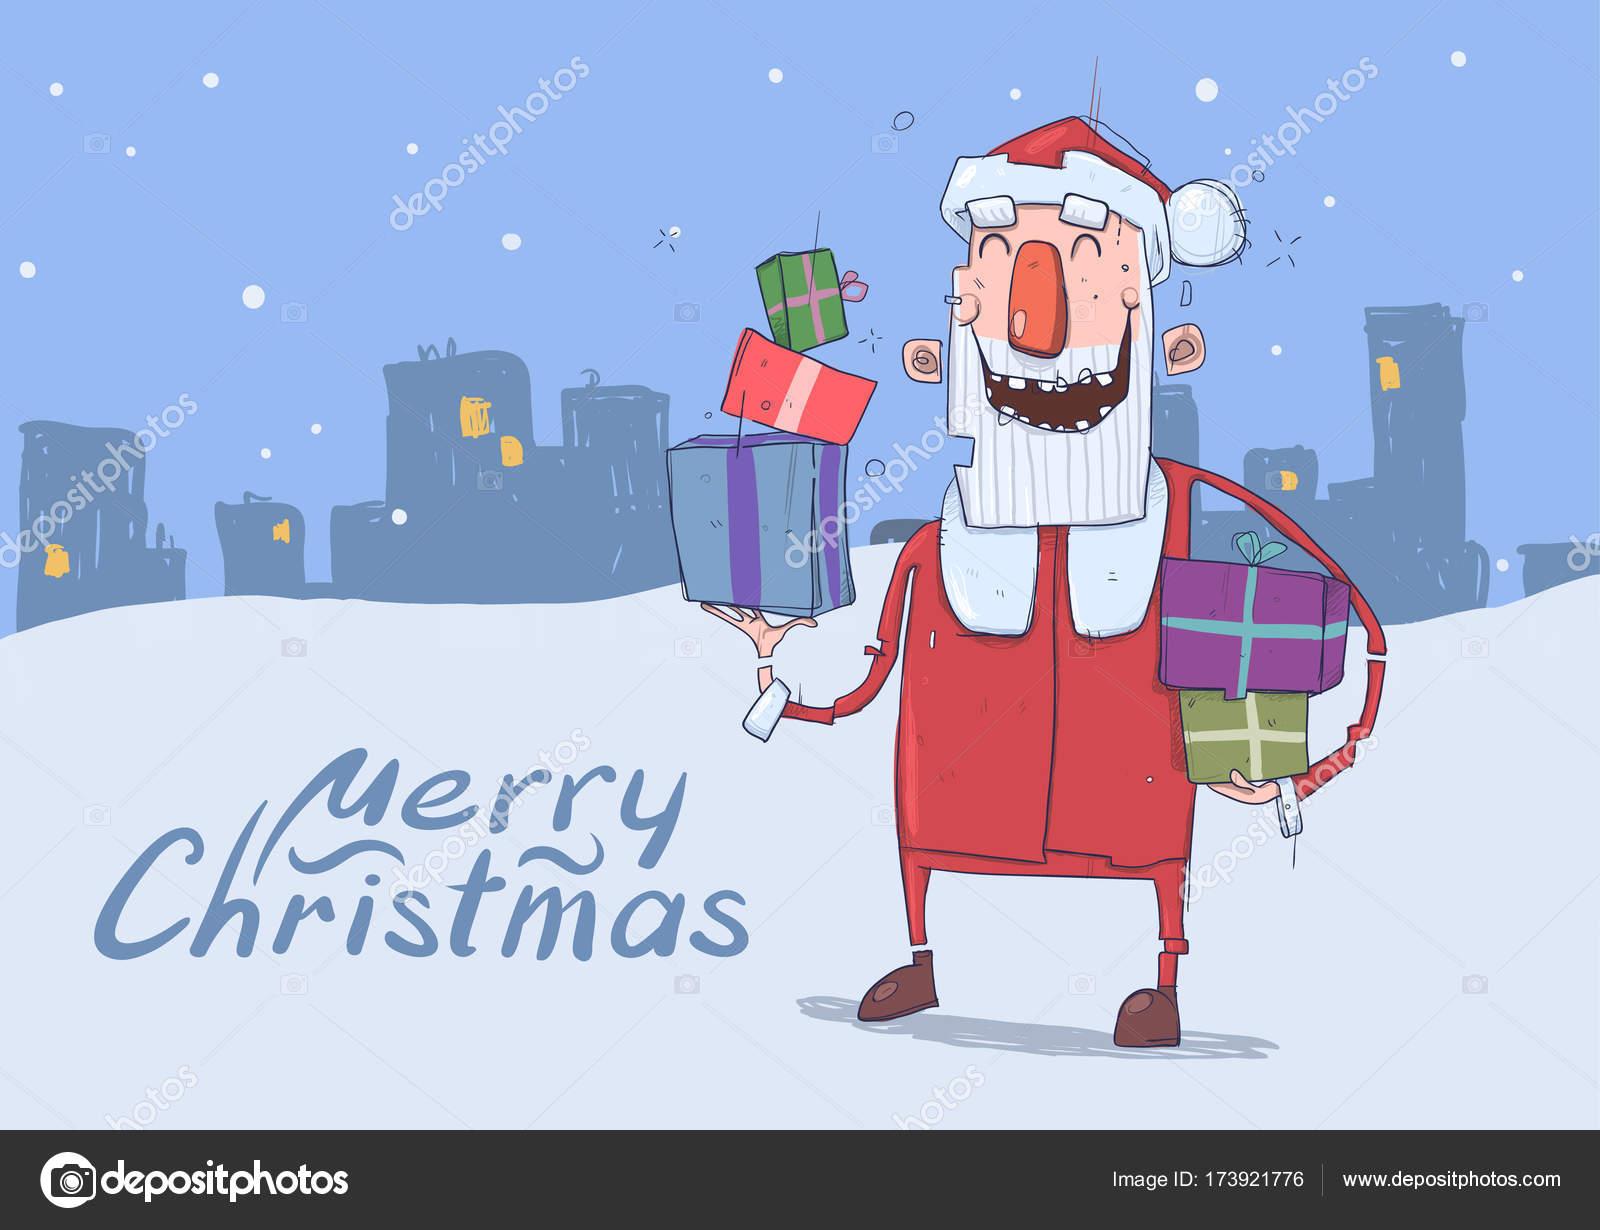 Christmas Card Of Funny Smiling Santa Claus Santa Claus Carries